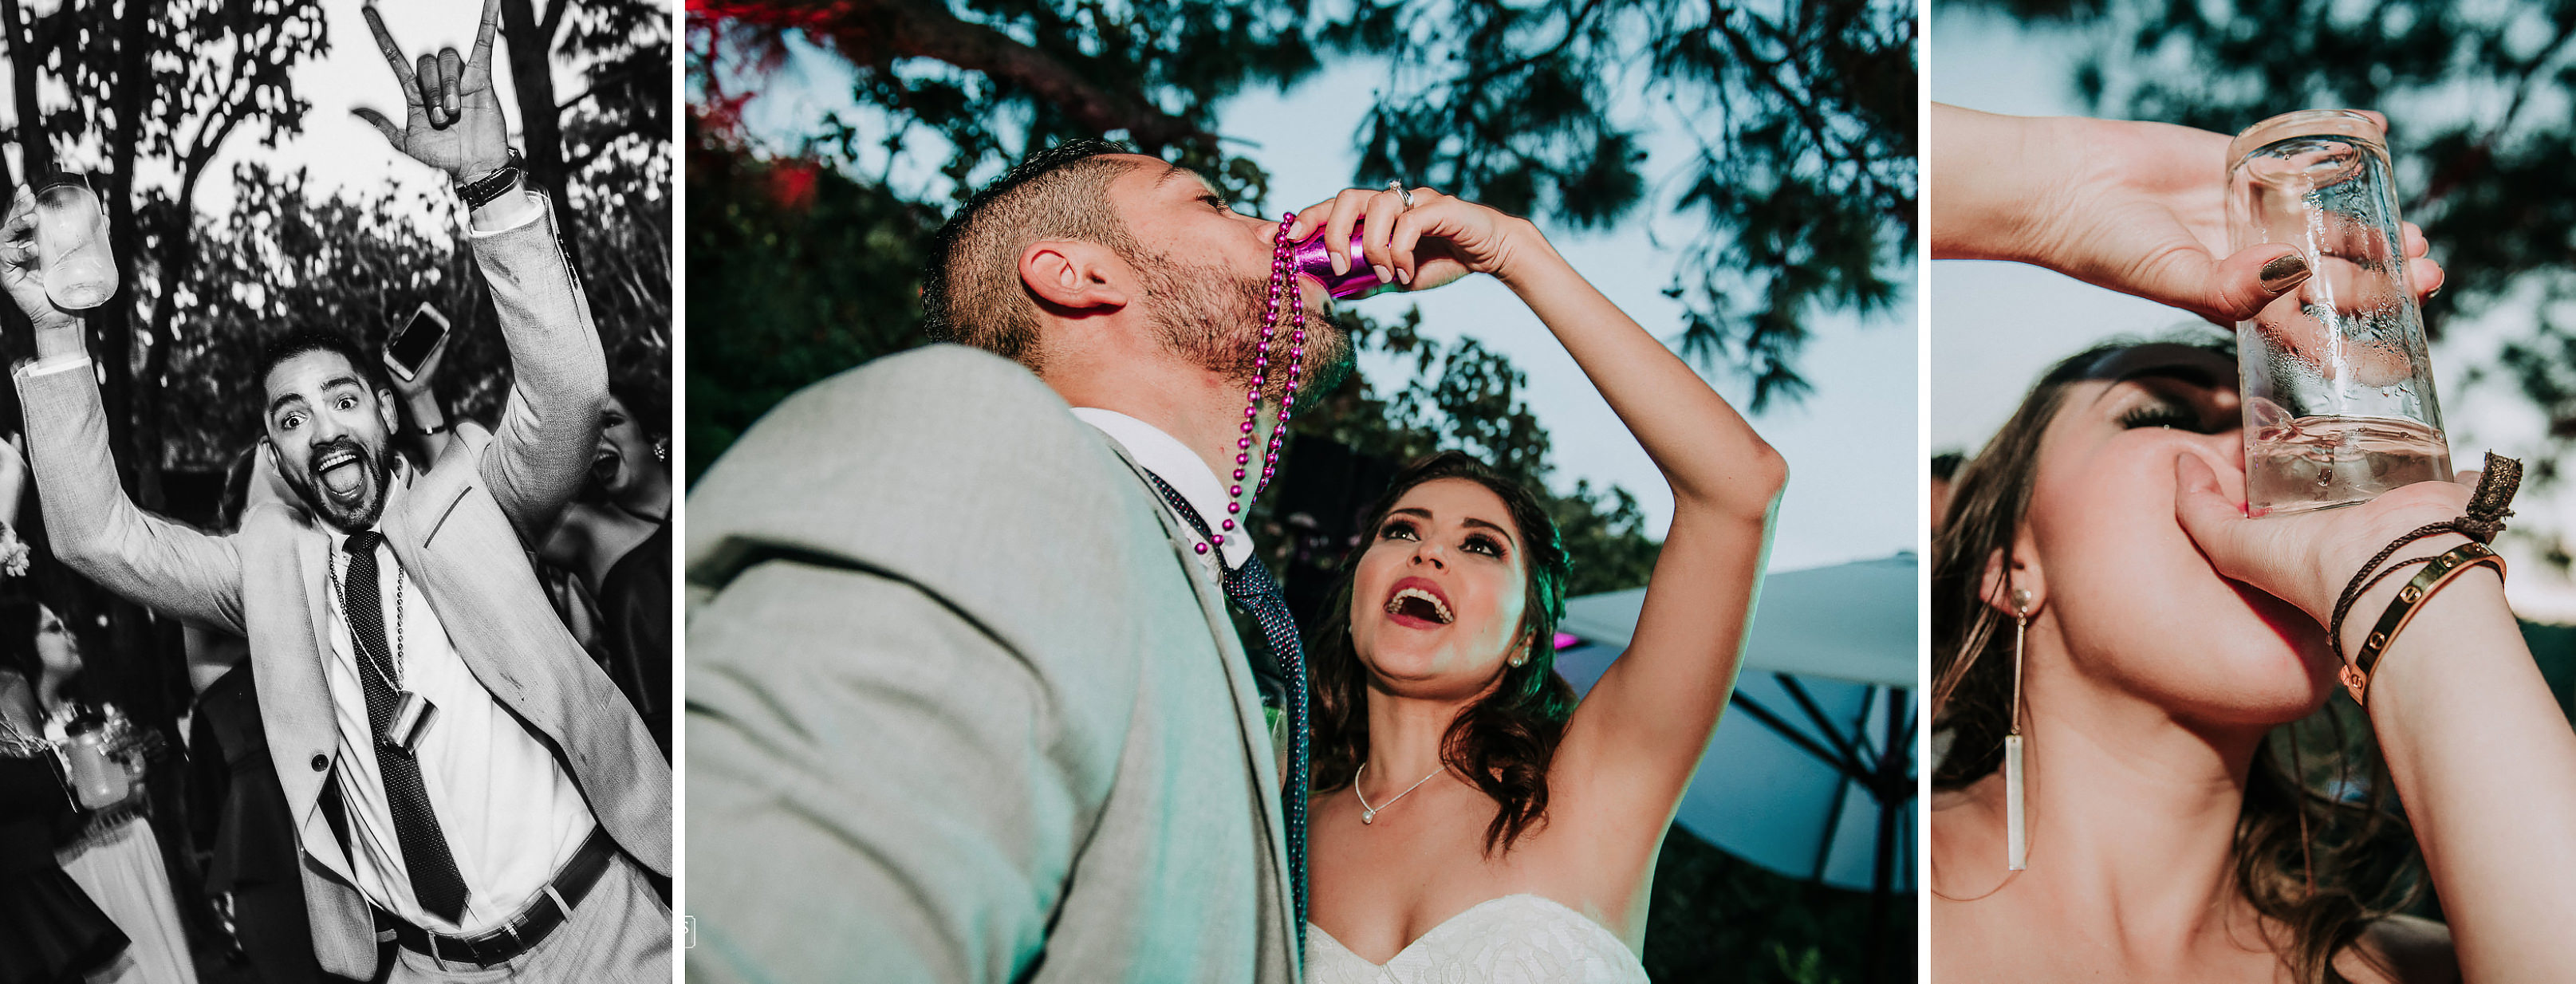 Fotografo de bodas guadalajara Alan Robles - Pinare terraza bistro 57